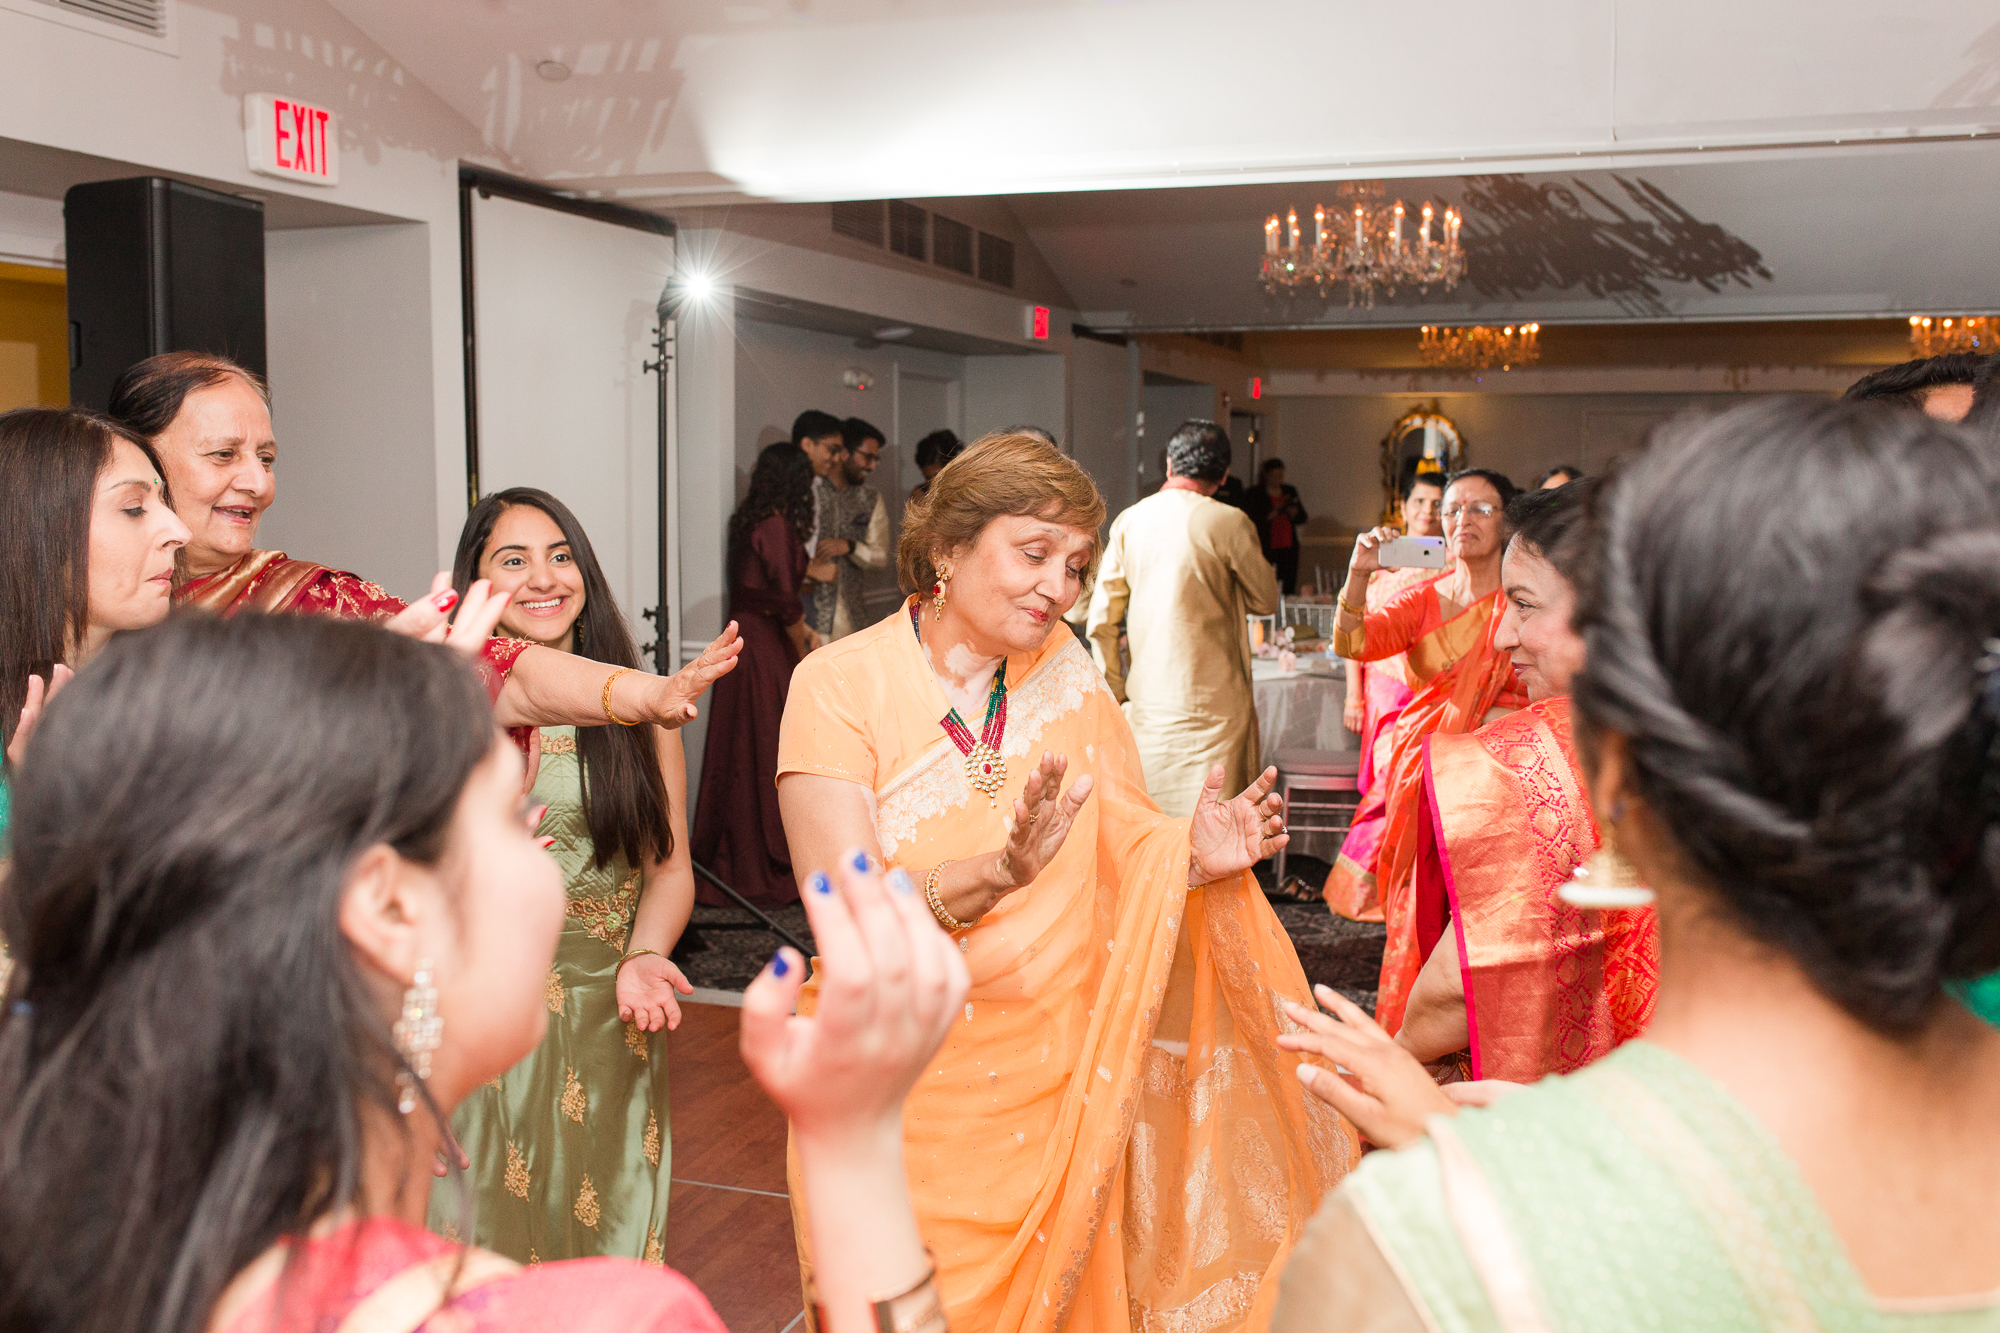 anumeet and gopika, indian engagement ring ceremony, top of the town, alexandria, northern virginia, nova weddings-110.jpg